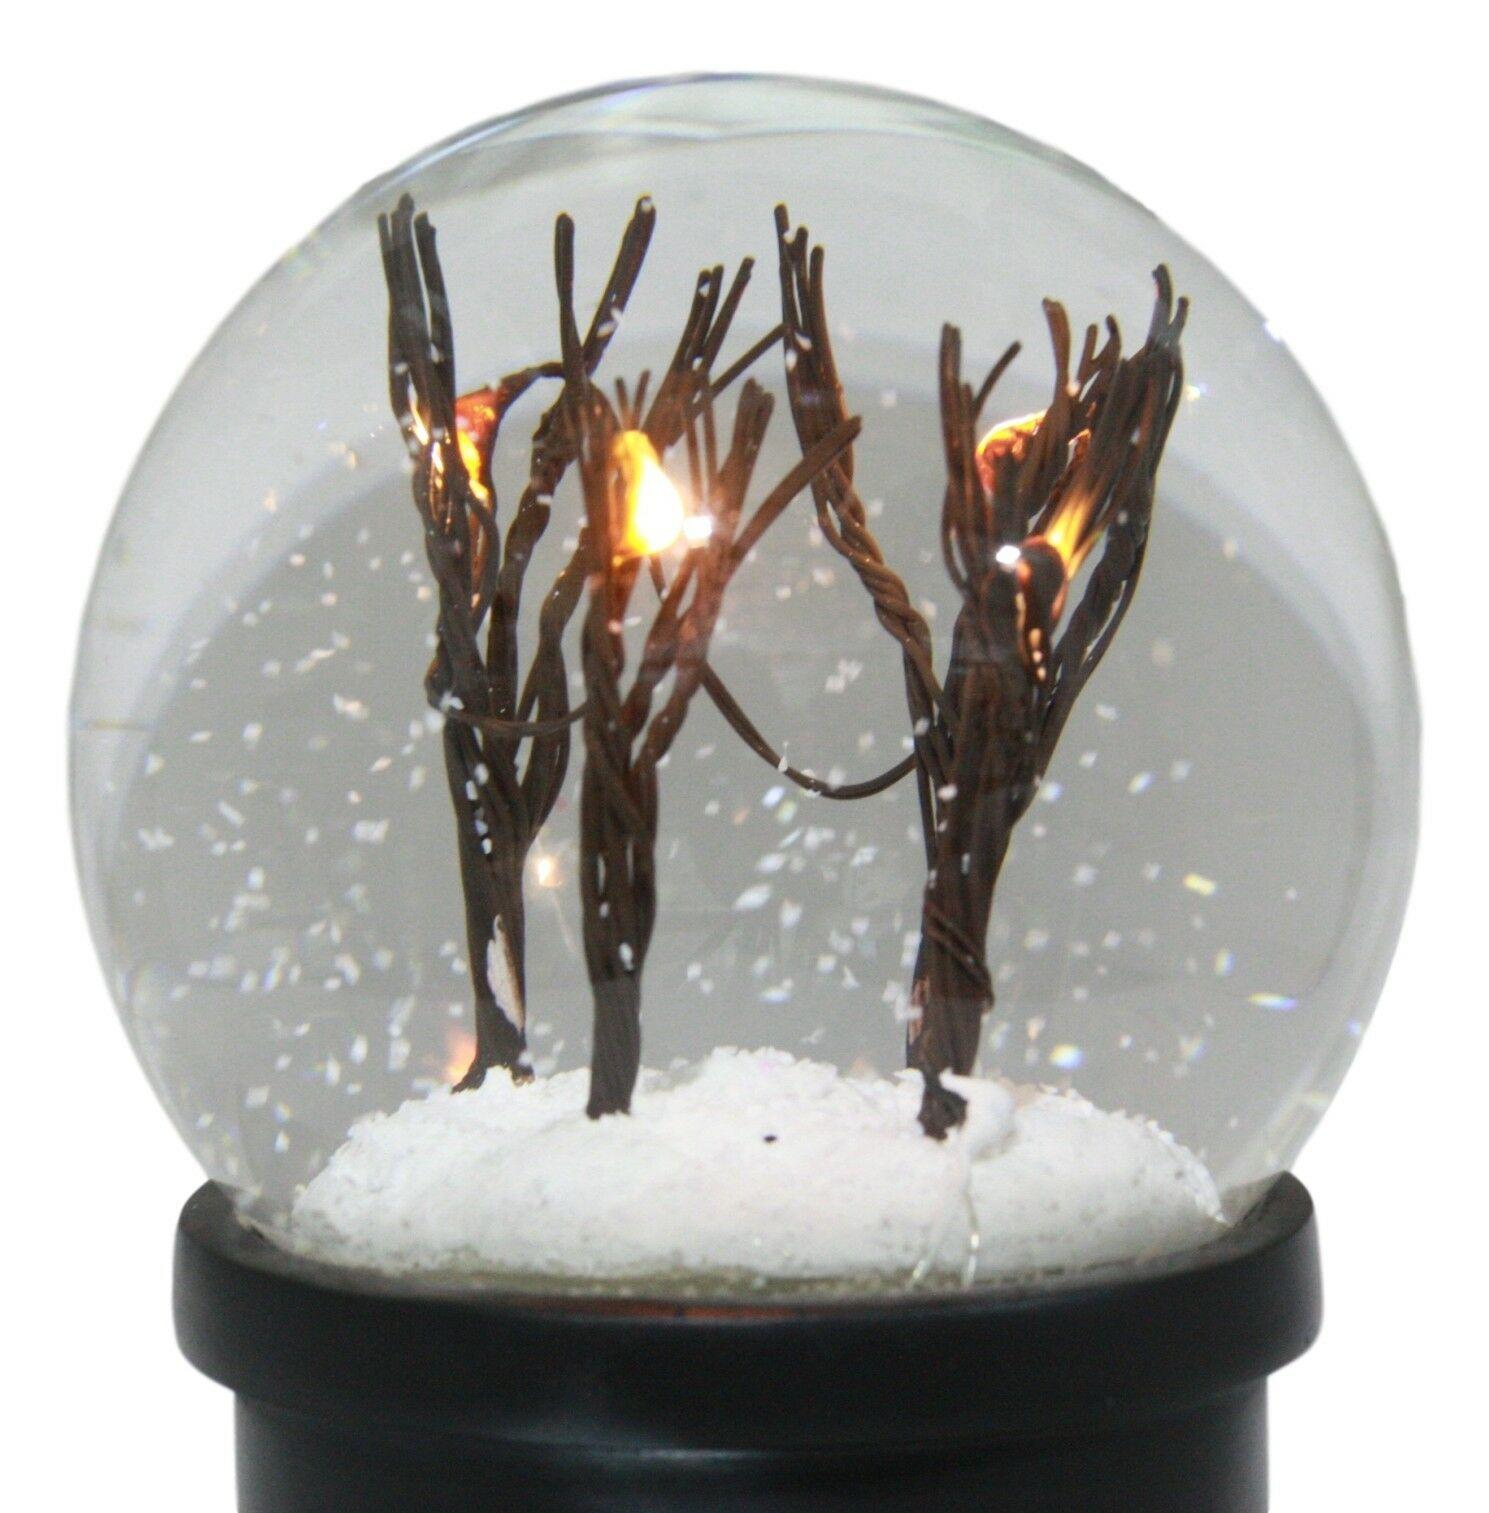 Snowy Windy Christmas Barren Winter Trees Night Scene ...